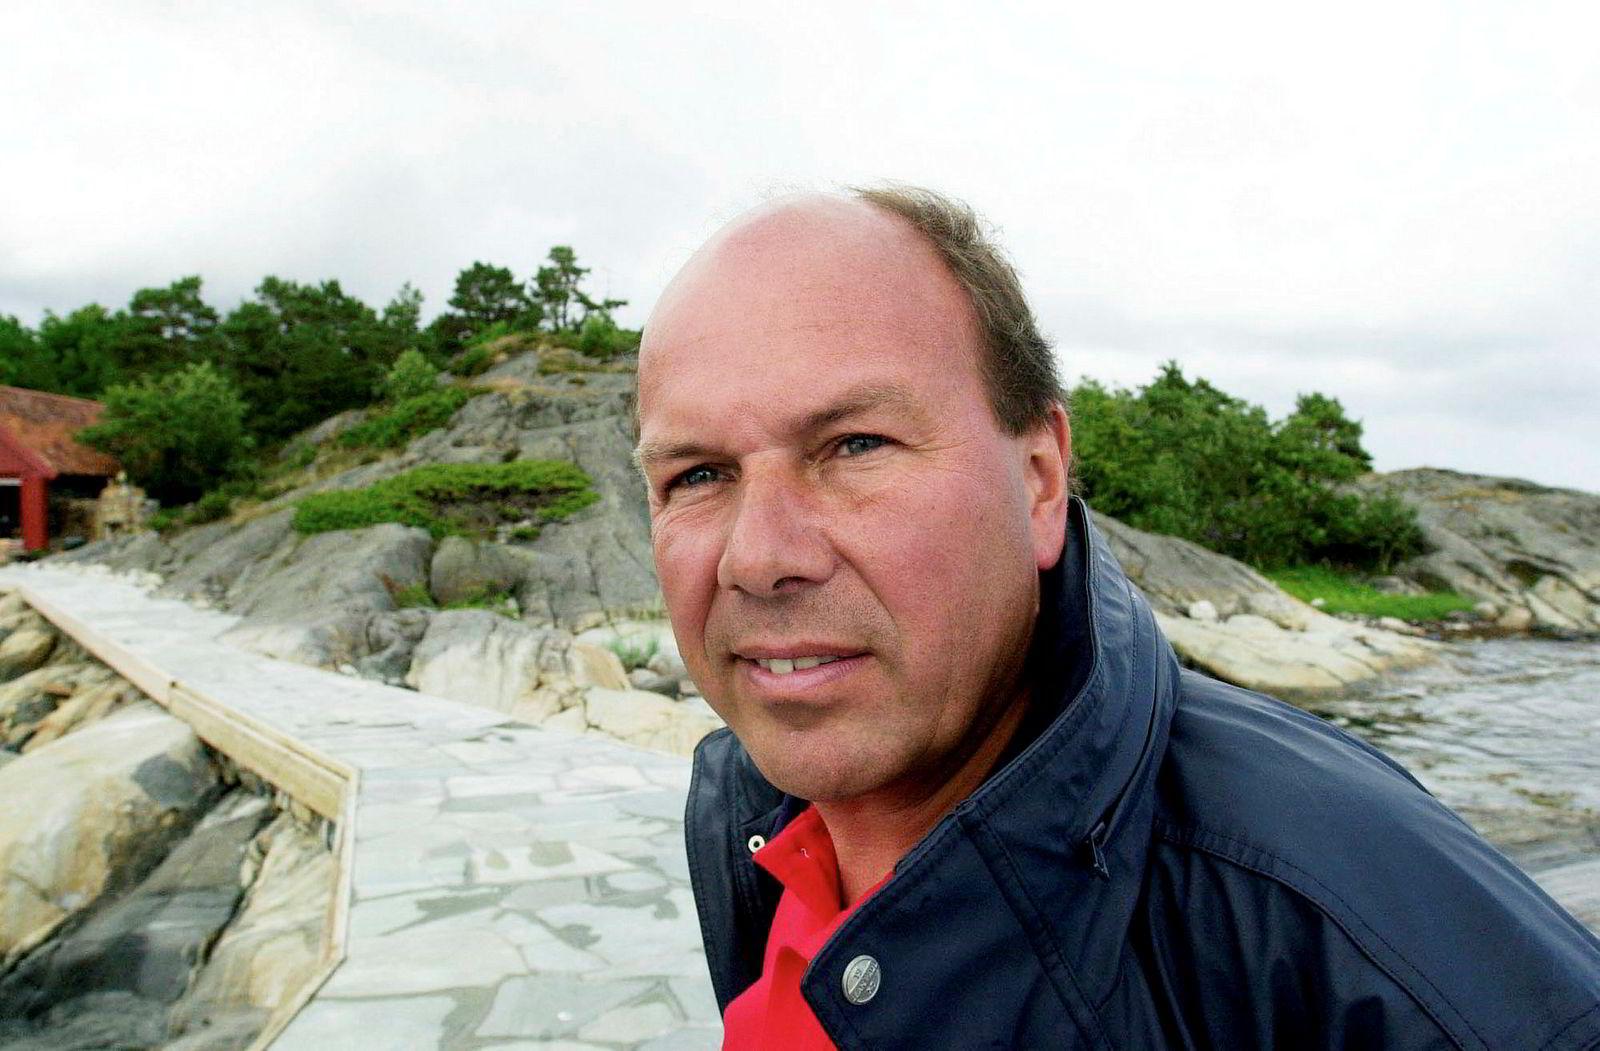 Andreas Ove Ugland